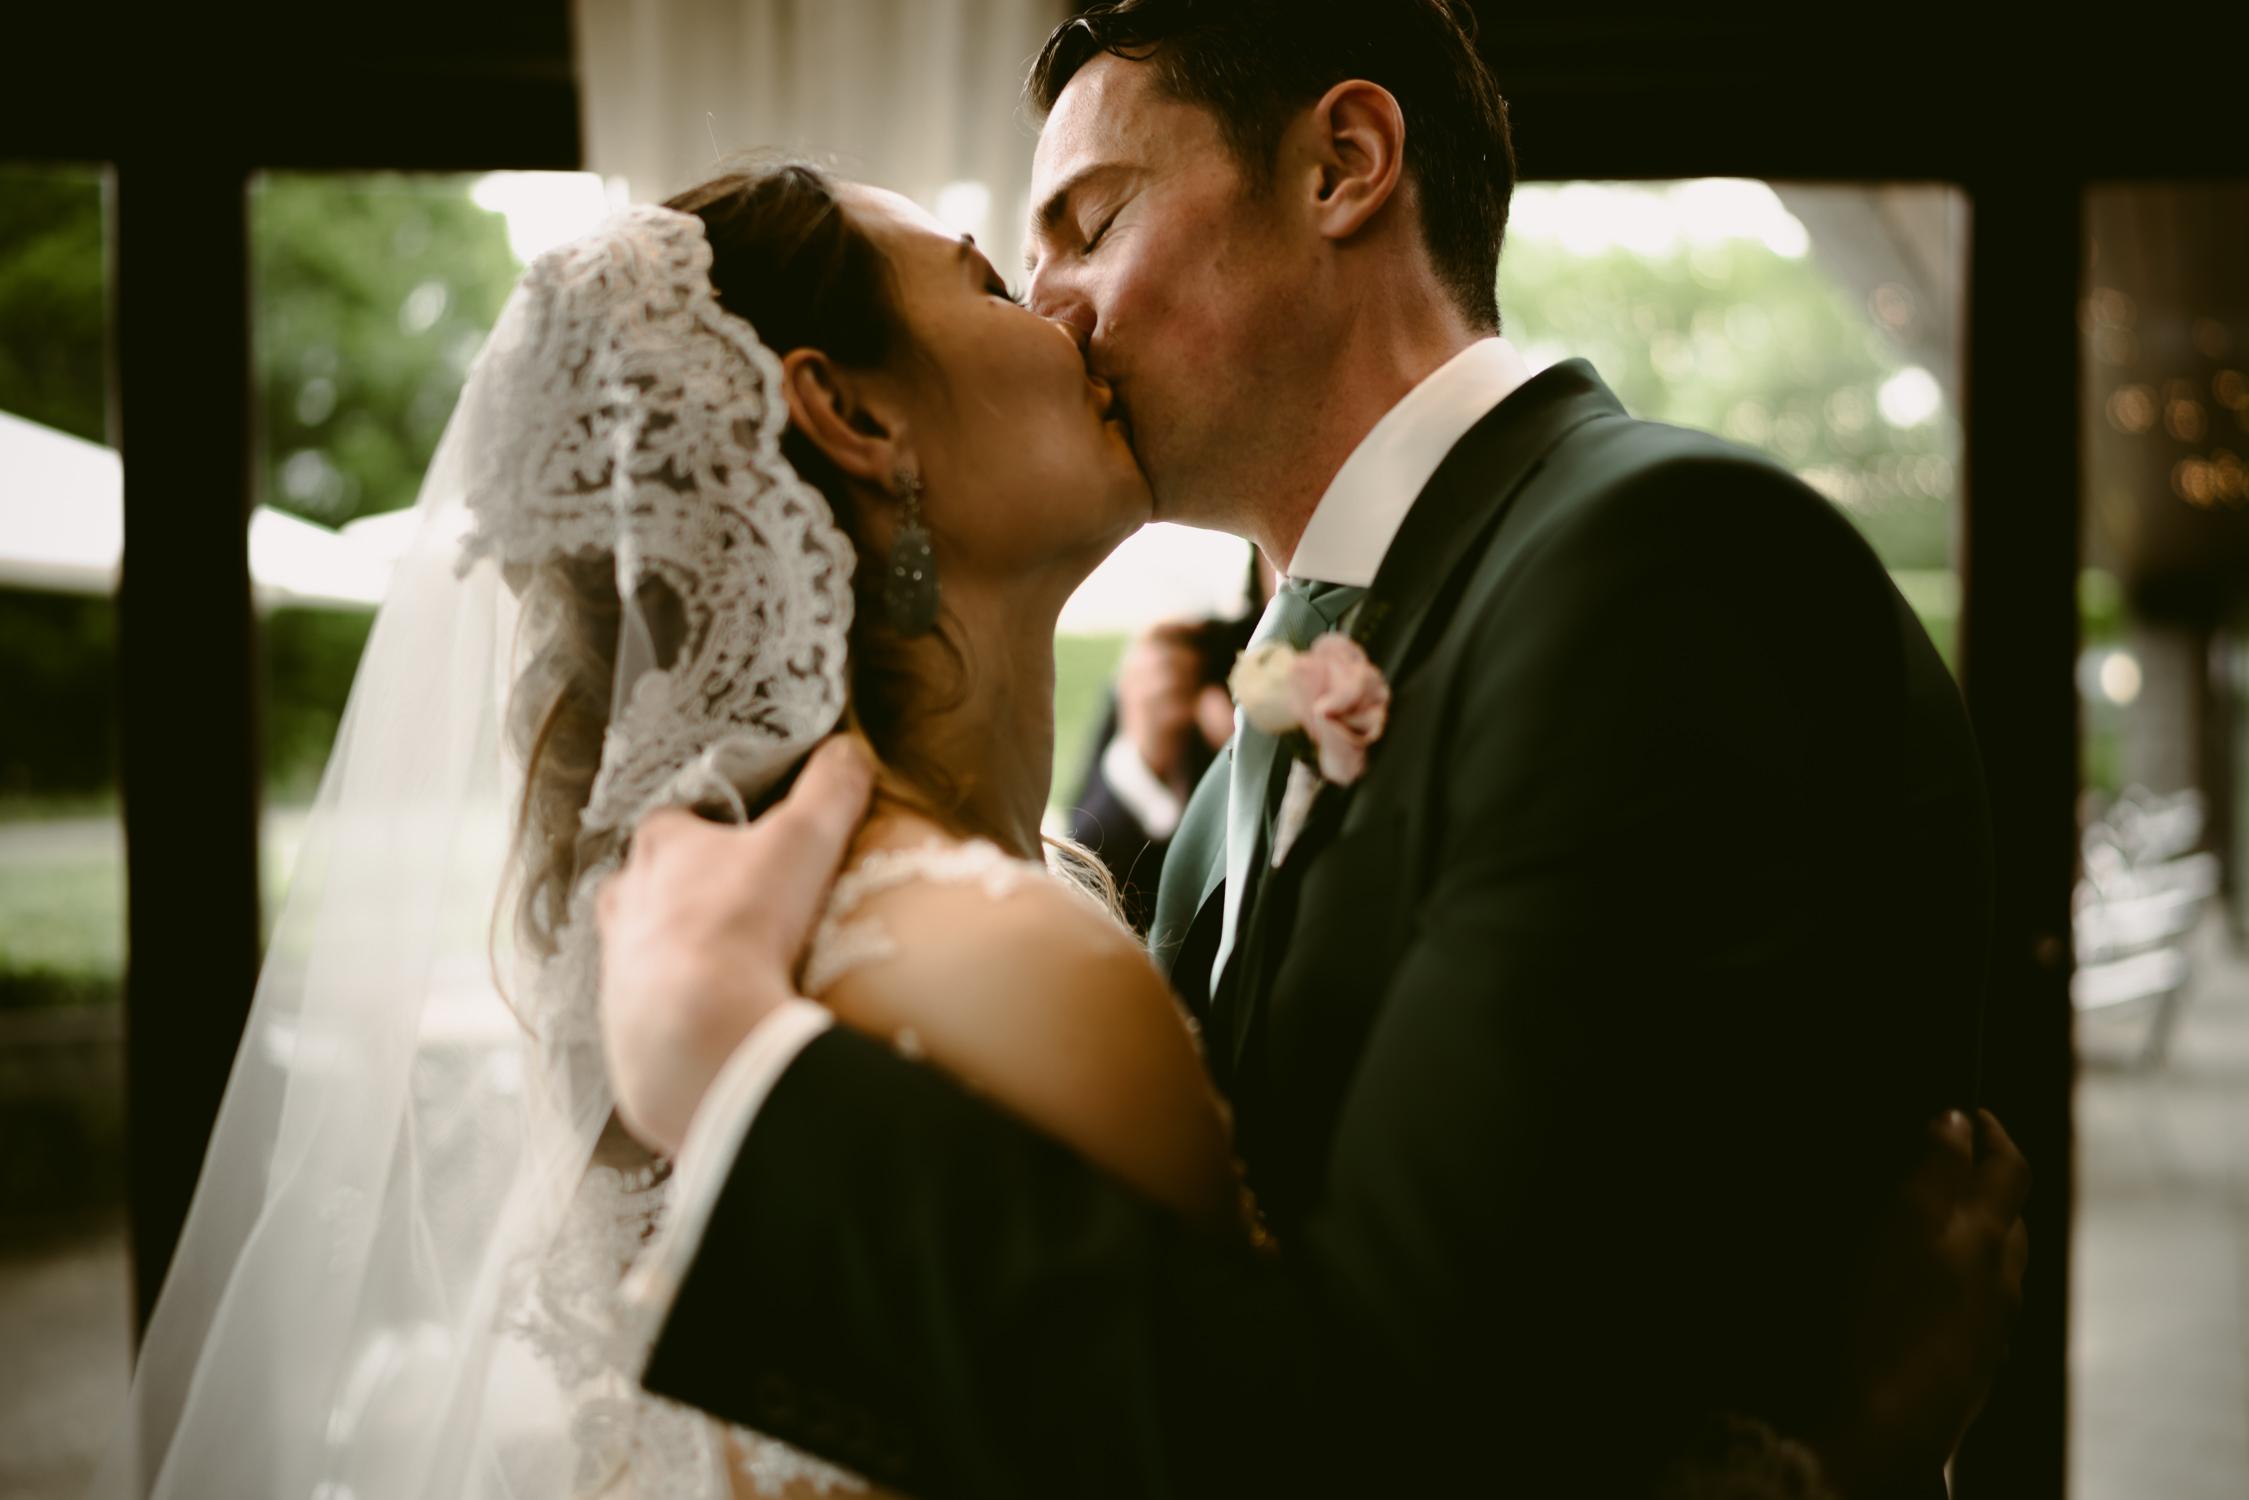 wedding photographer amsterdam rosarium cermony kiss